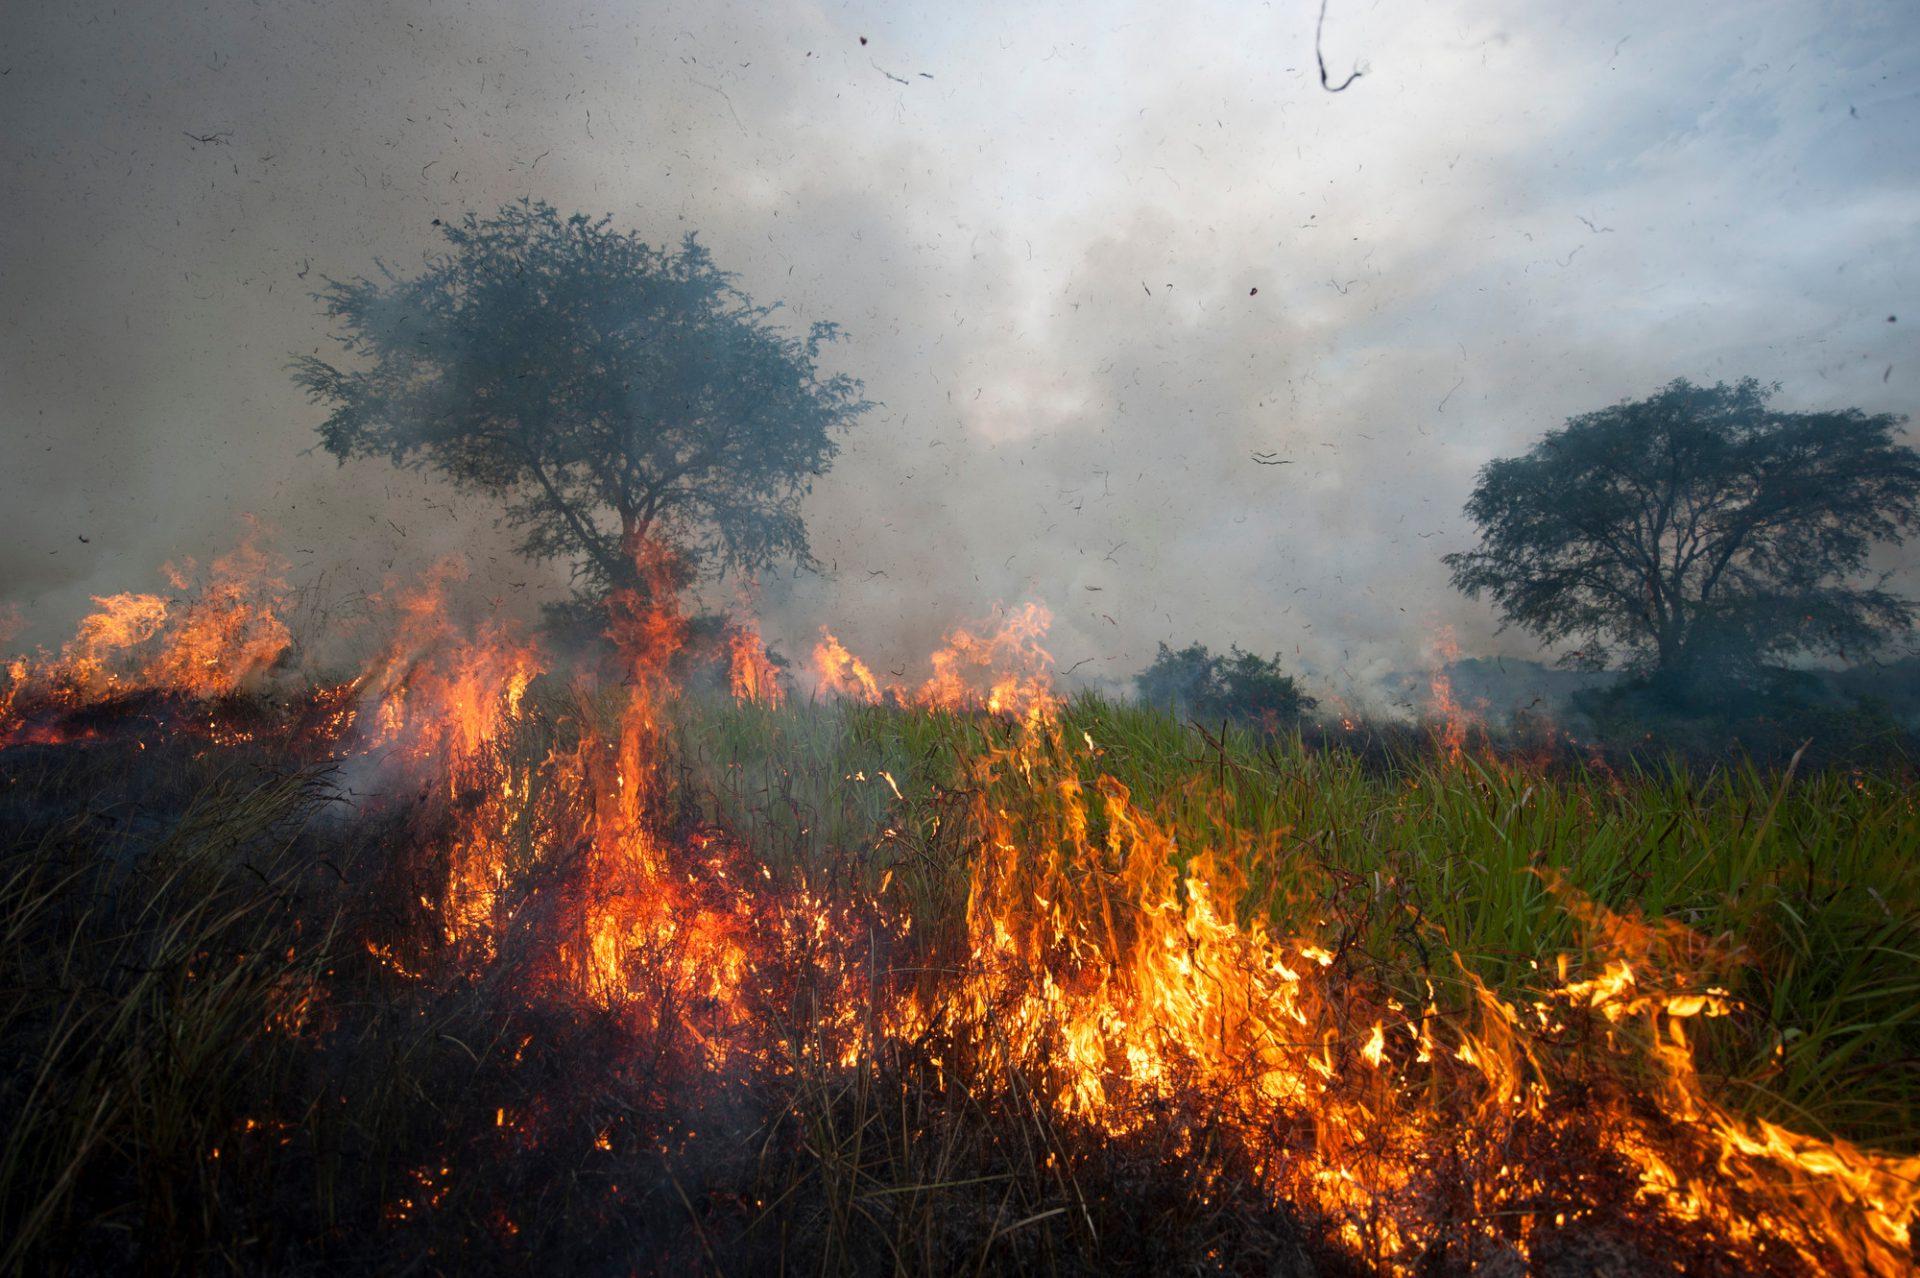 Photo: A fire burns out of control through the savanna.